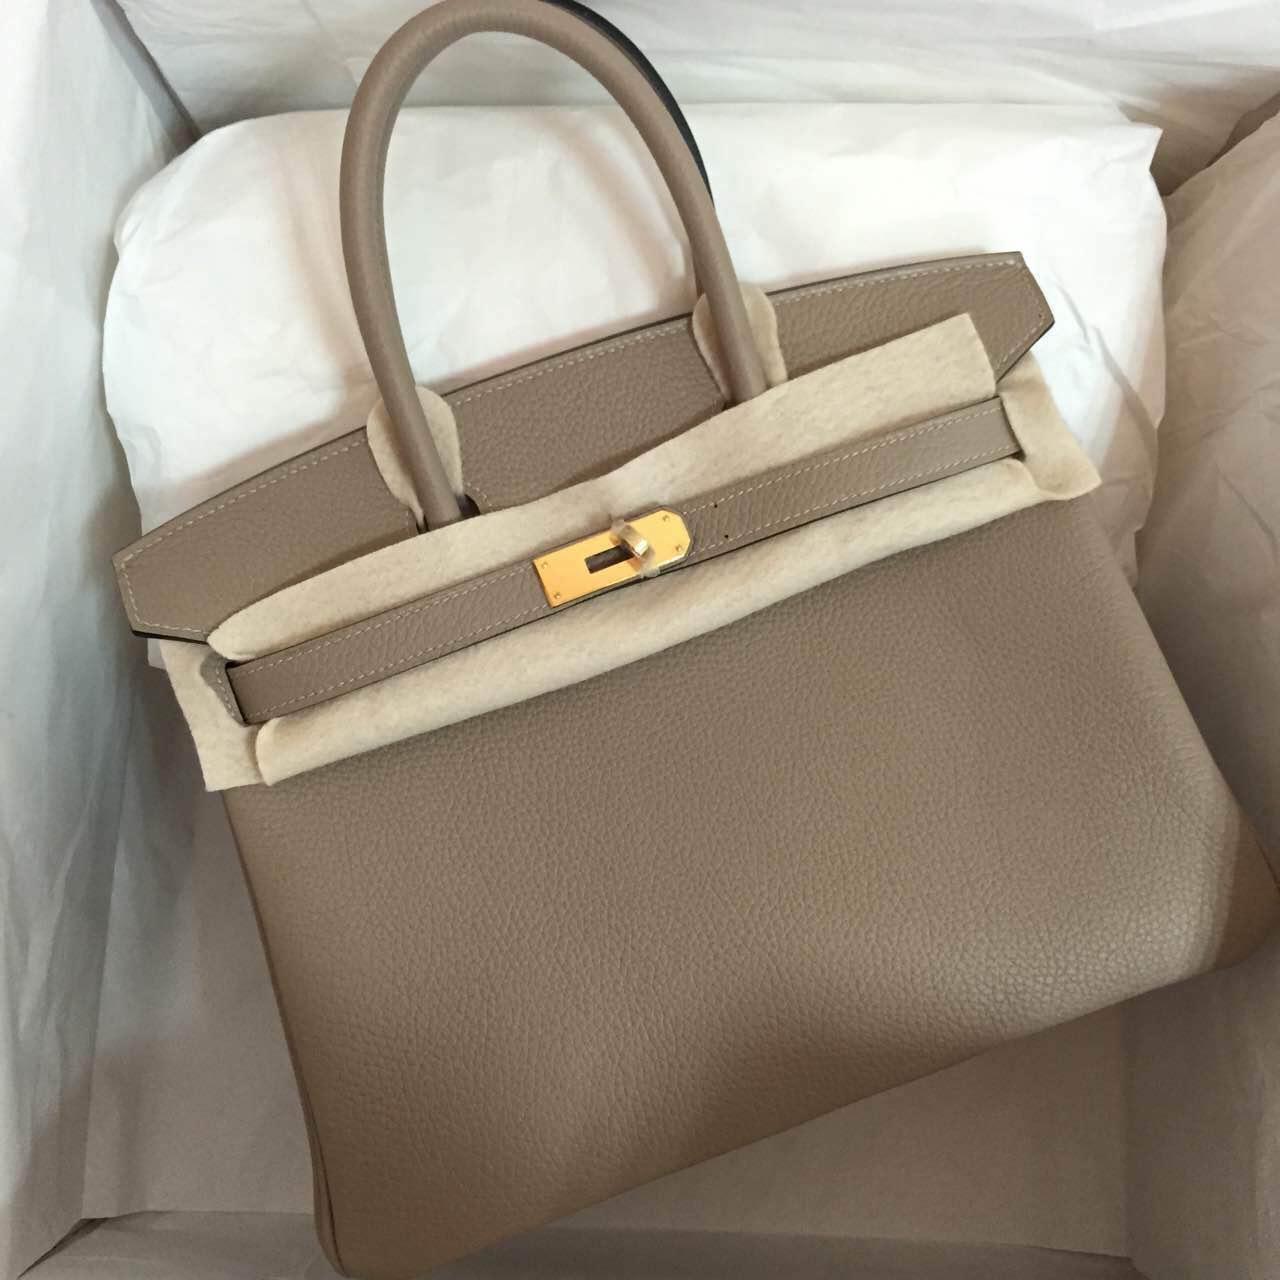 Hand Stitching Hermes Birkin Bag 30cm Gris Tourterelle Clemence Leather Handbag